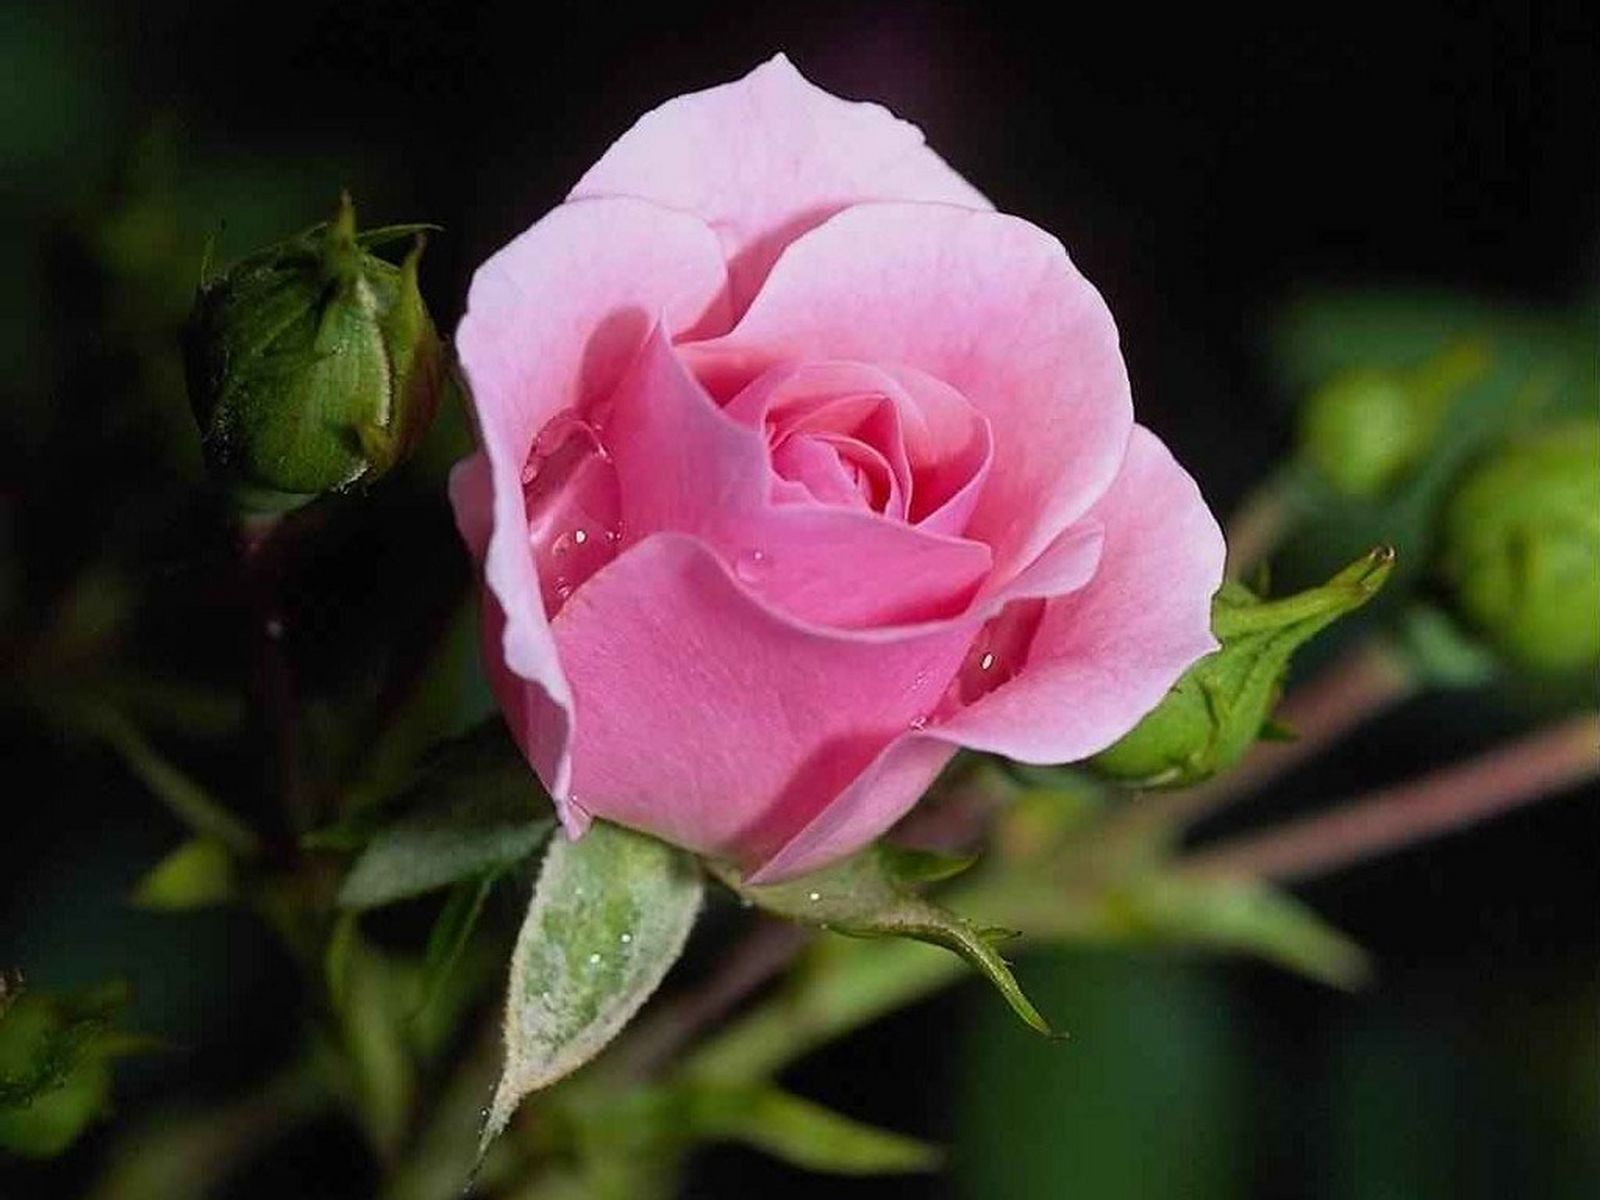 http://4.bp.blogspot.com/-8l2ohzS47xk/Tig9xHet90I/AAAAAAAAGZk/BN7w9UCyhj8/s1600/Roses_05.jpg